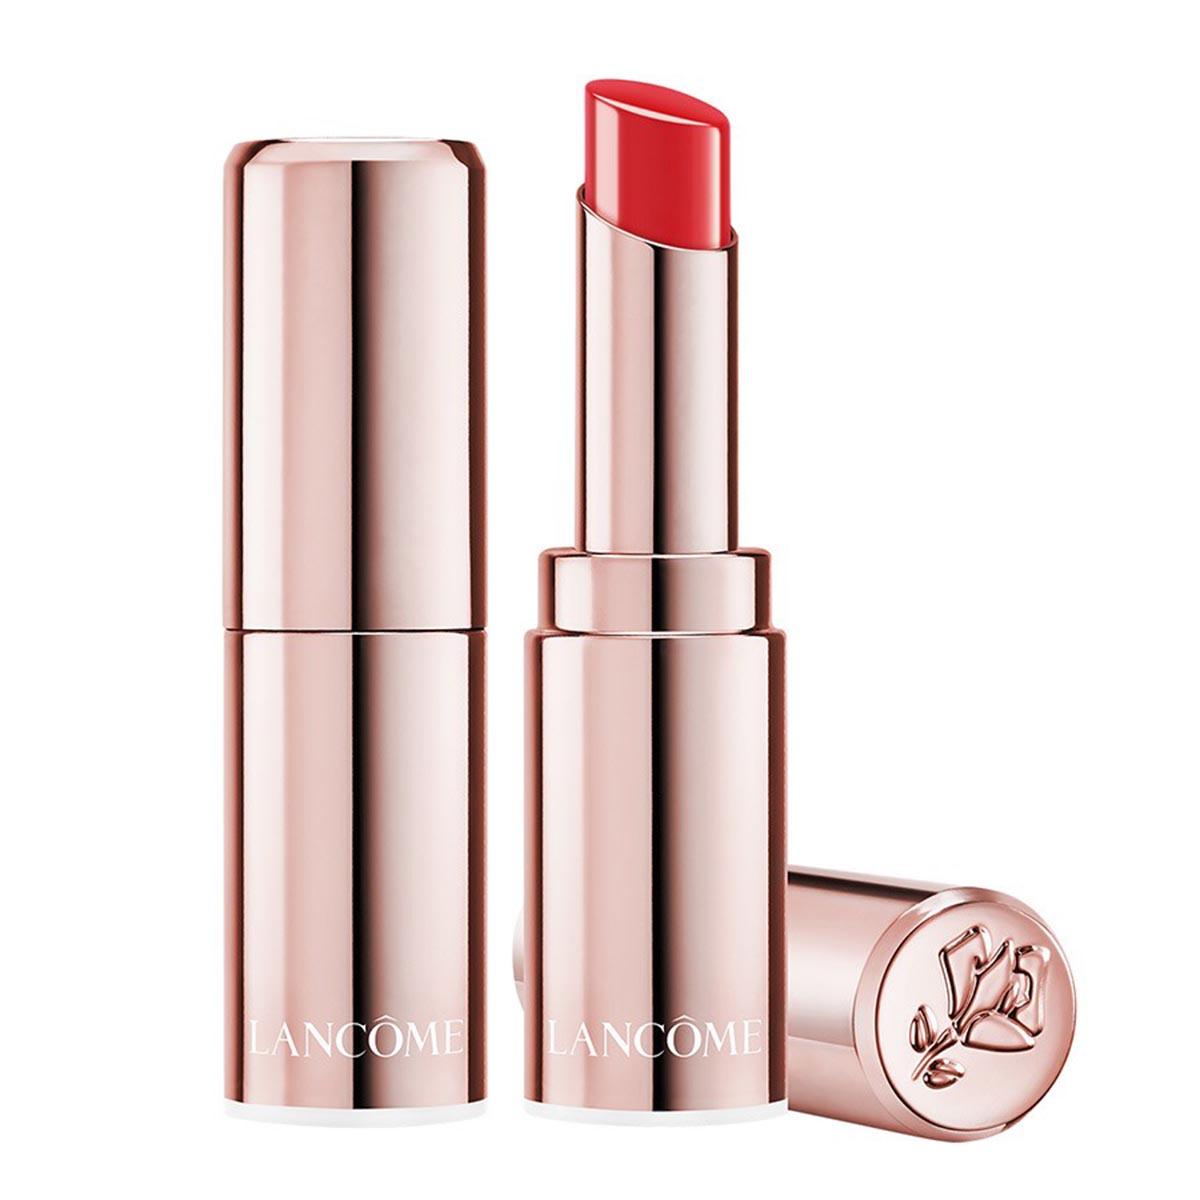 Lancome l absolu mademoiselle shine lipstick 382 mademoiselle shine